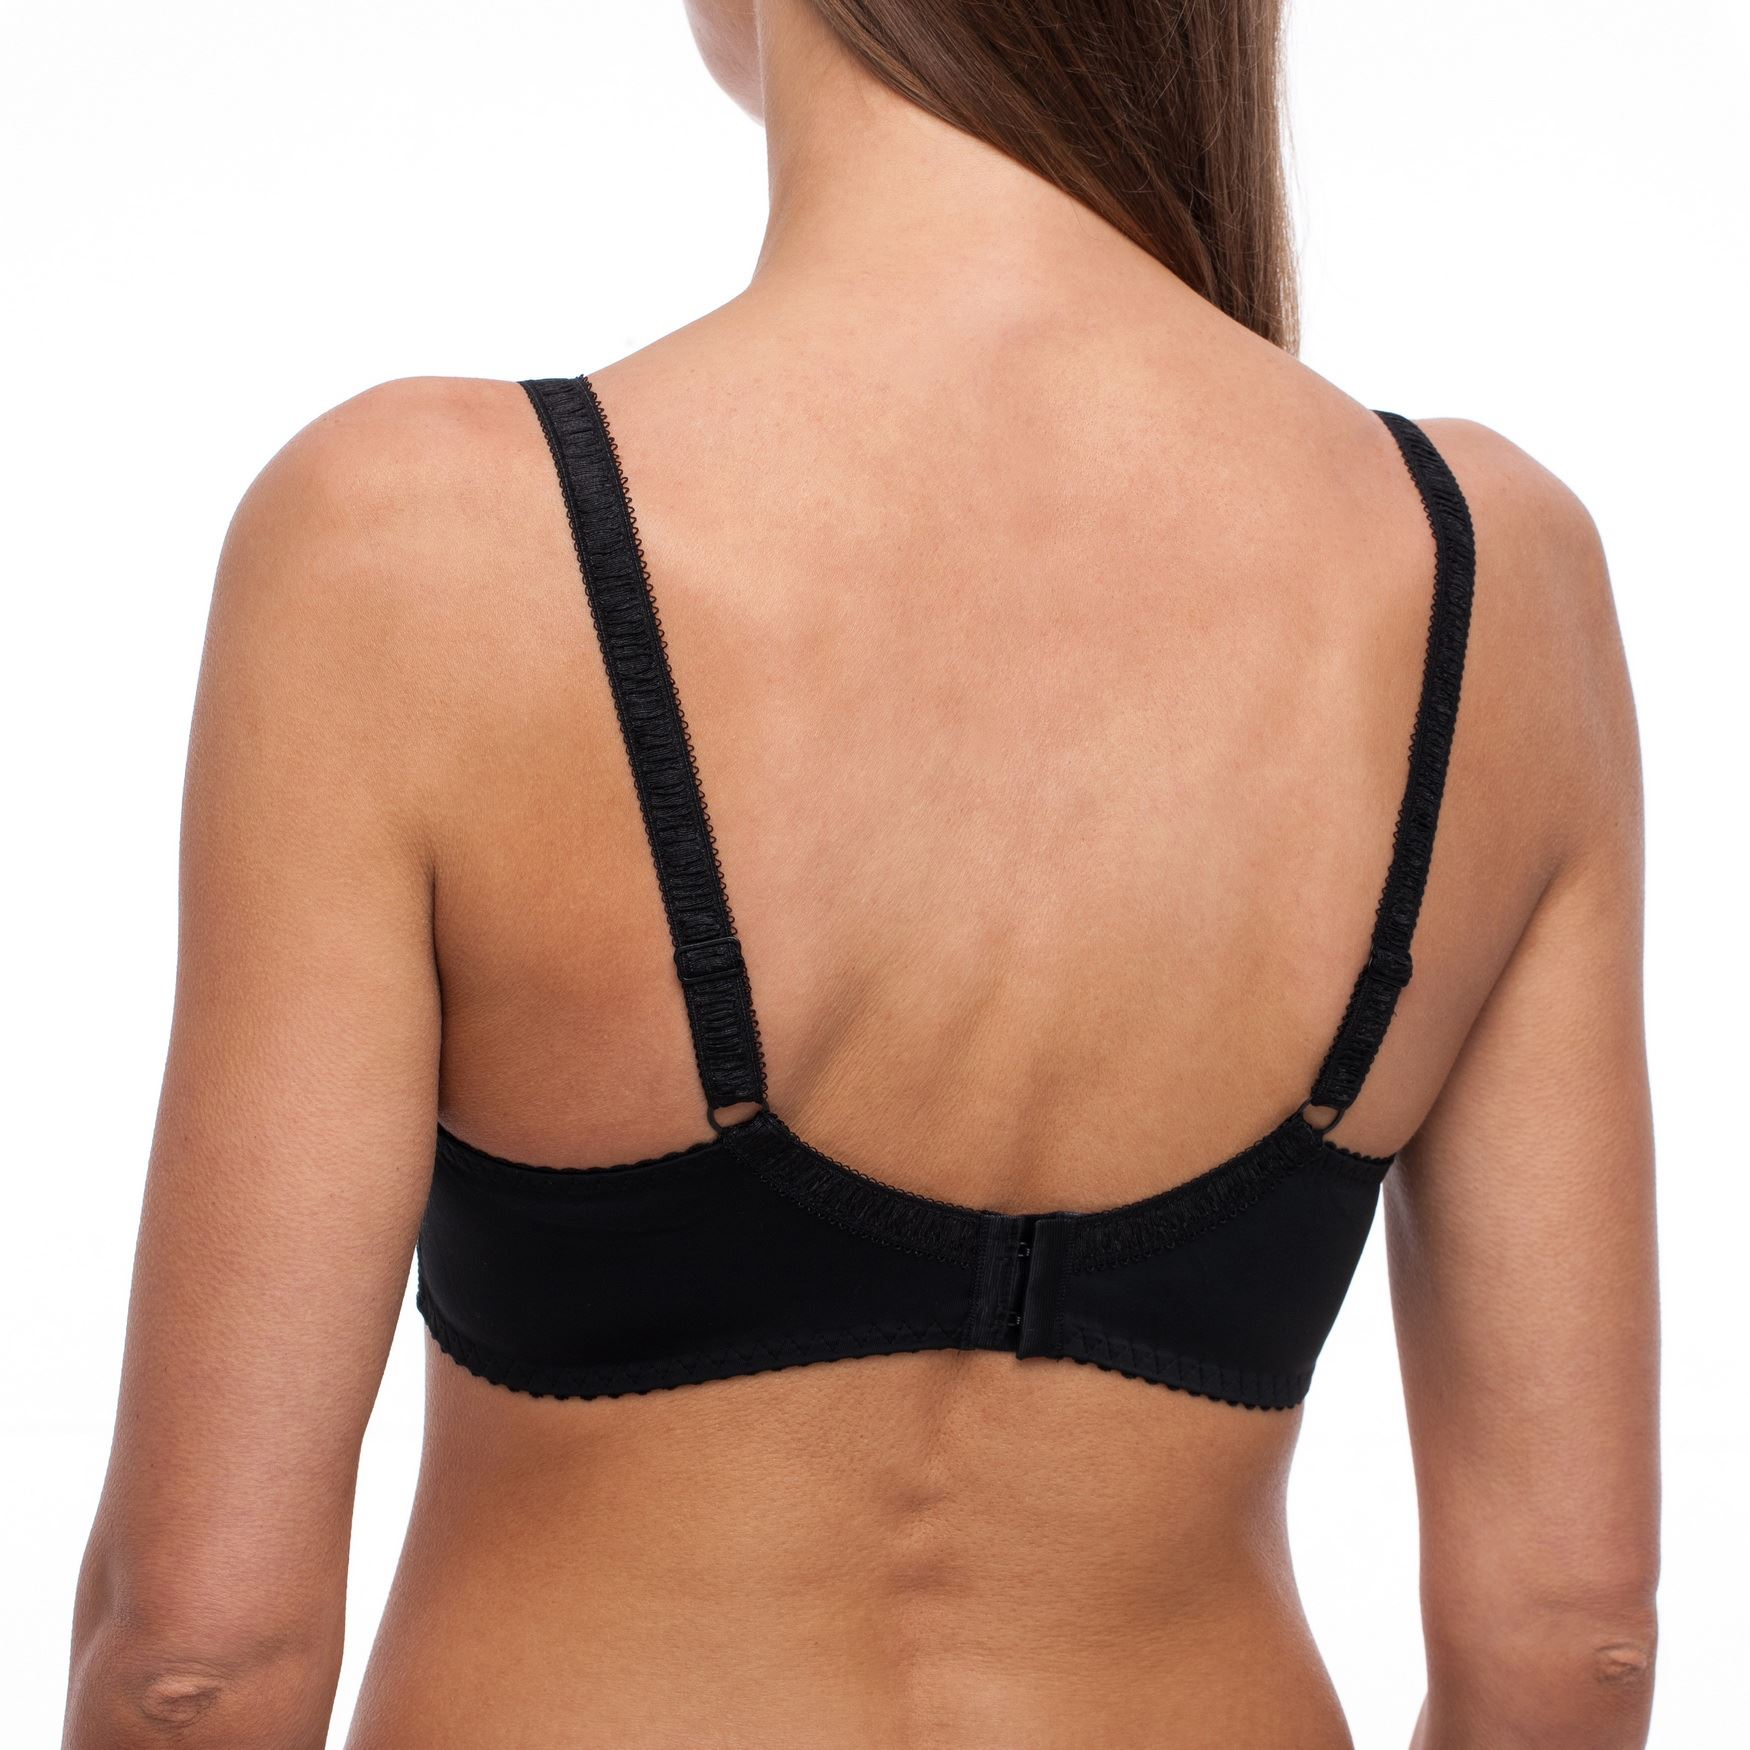 Minimizer-Plus-Size-Sheer-Lace-Unlined-Comfort-Full-Coverage-Sleep-Figure-Bra thumbnail 9